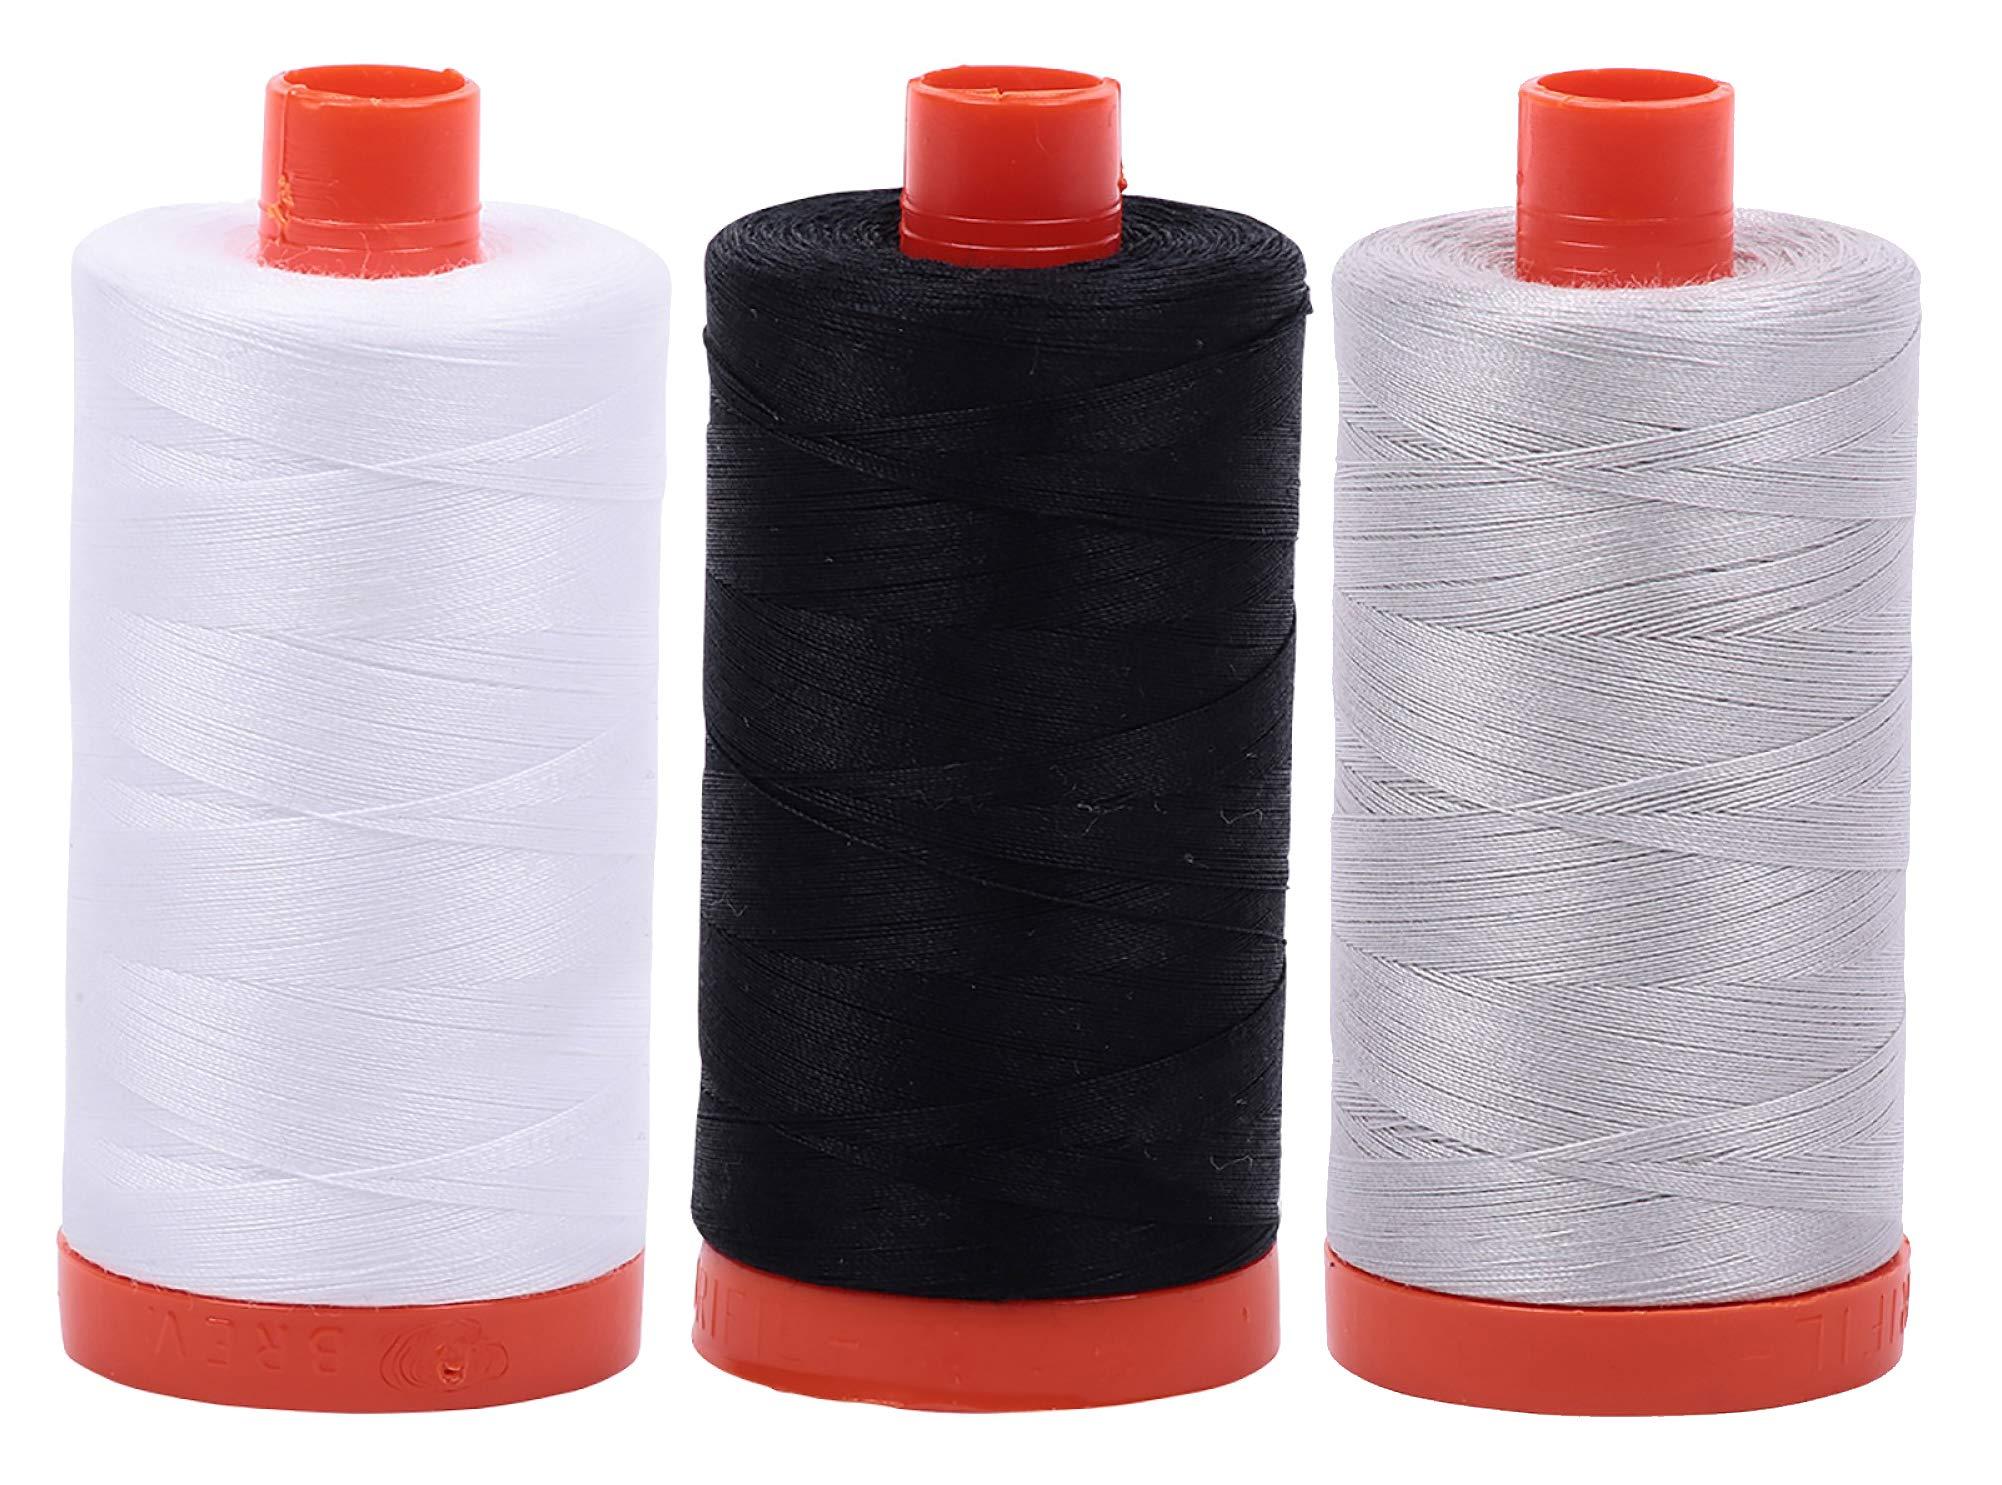 AURIFIL Cotton Mako 50wt Thread 3 Large Spools: White + Black + Aluminum (2024+2692+2615) by Aurifil